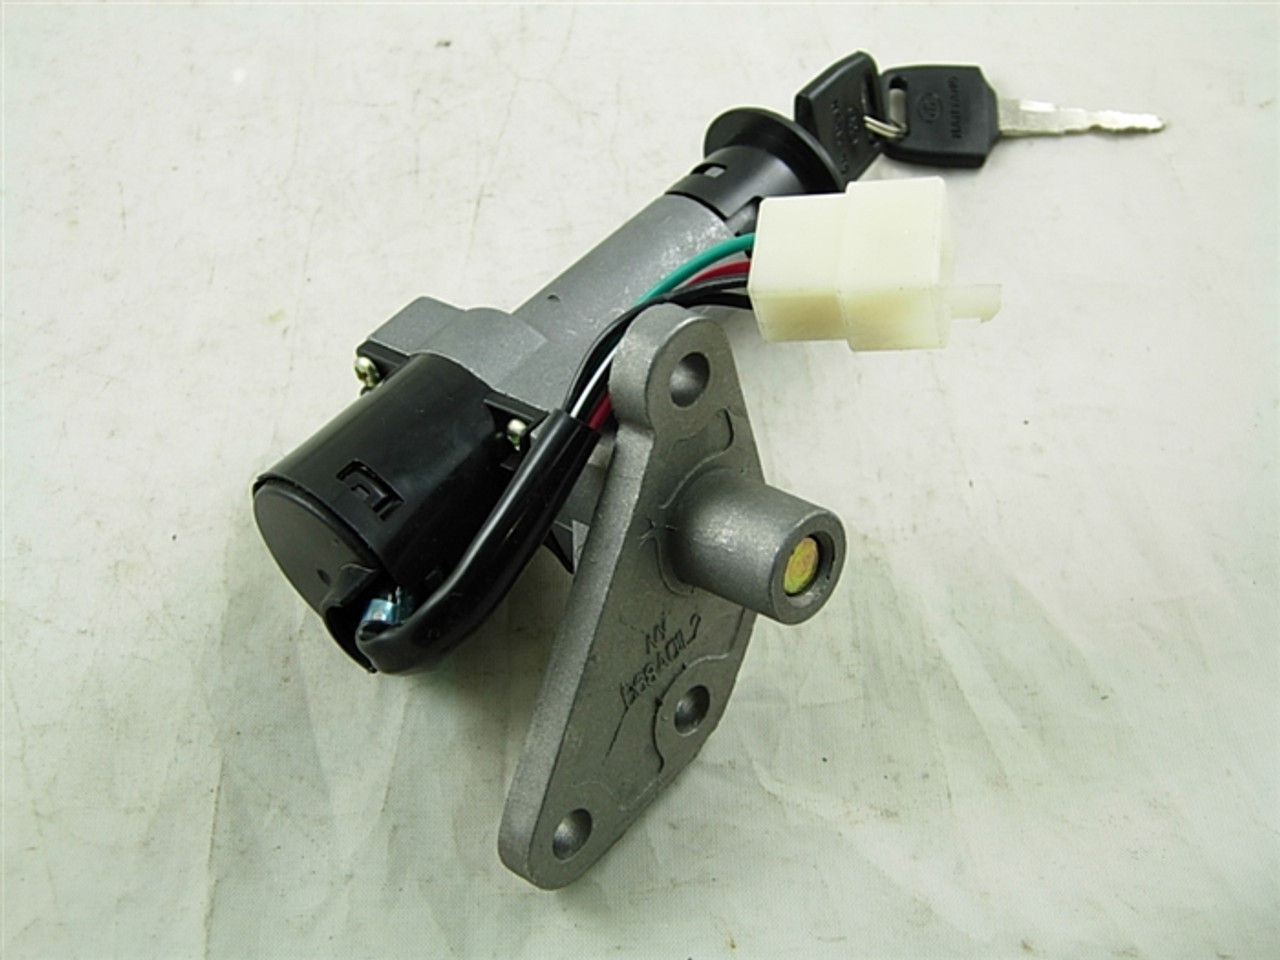 ignition switch / lock /key 11019-a57-11